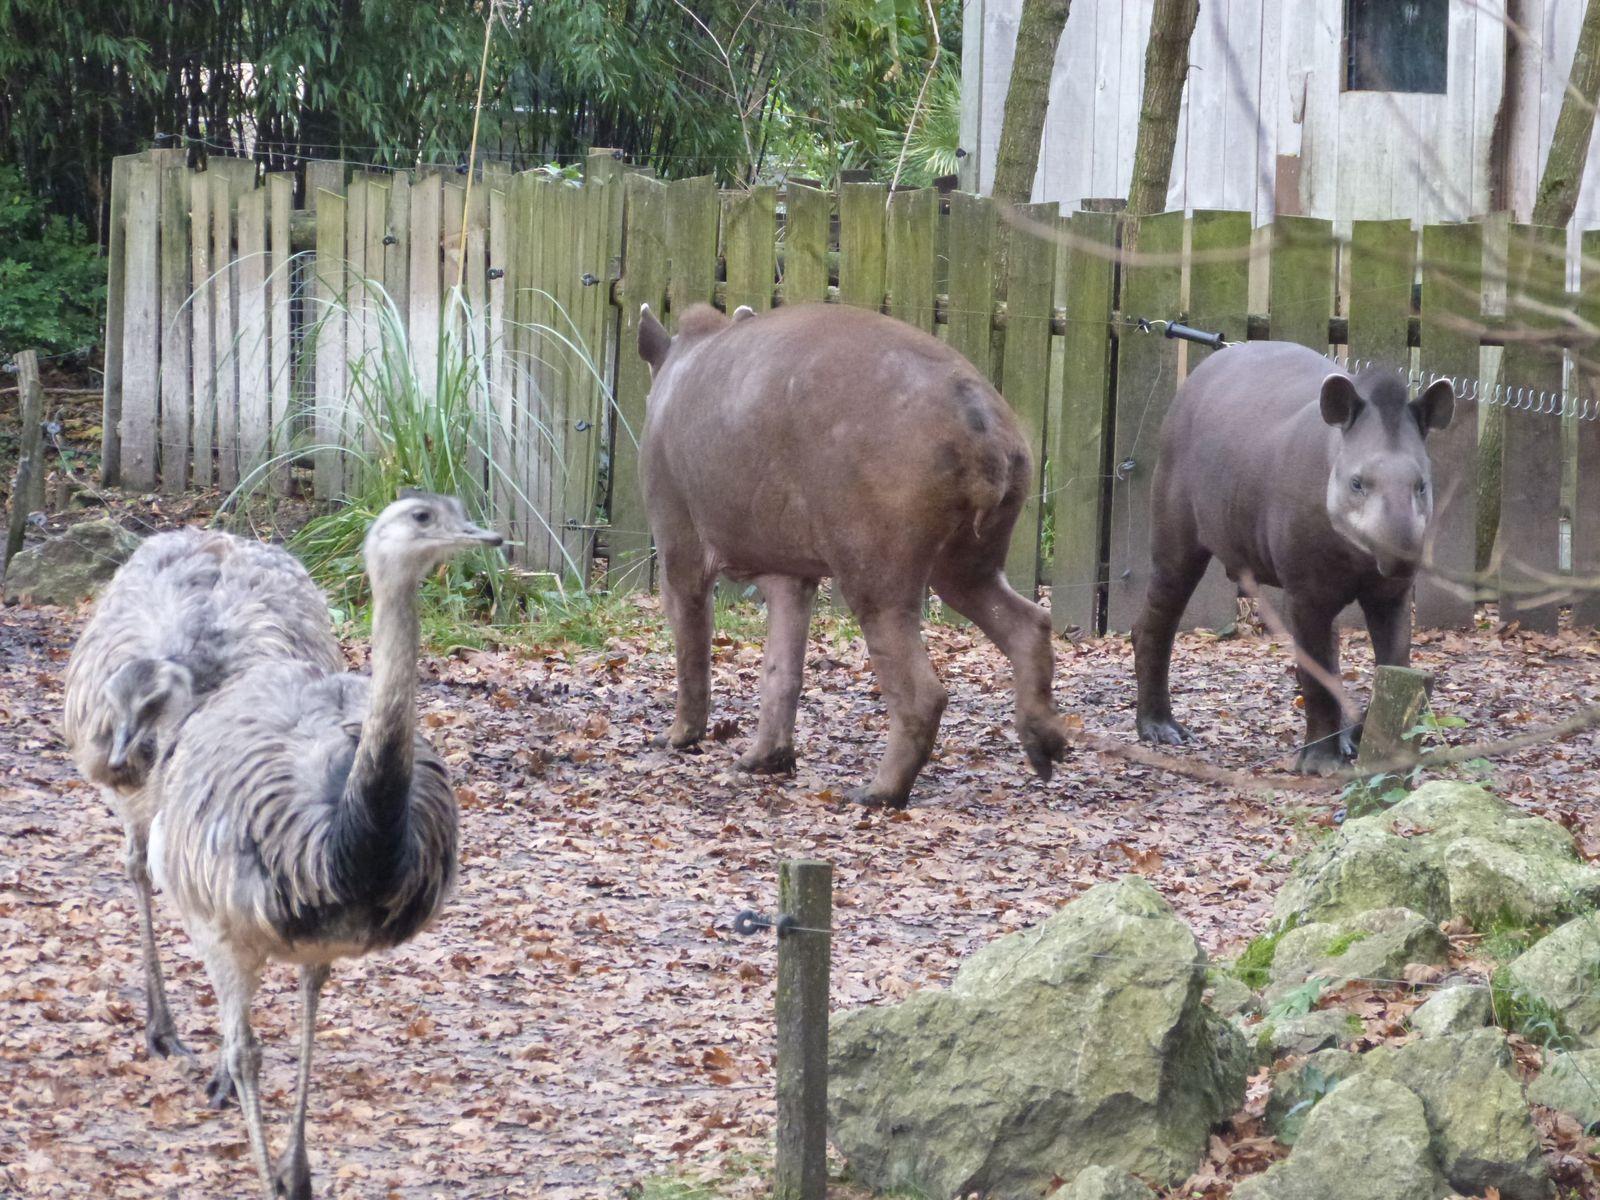 Notre visite au Zoo de pessac, novembre 2012